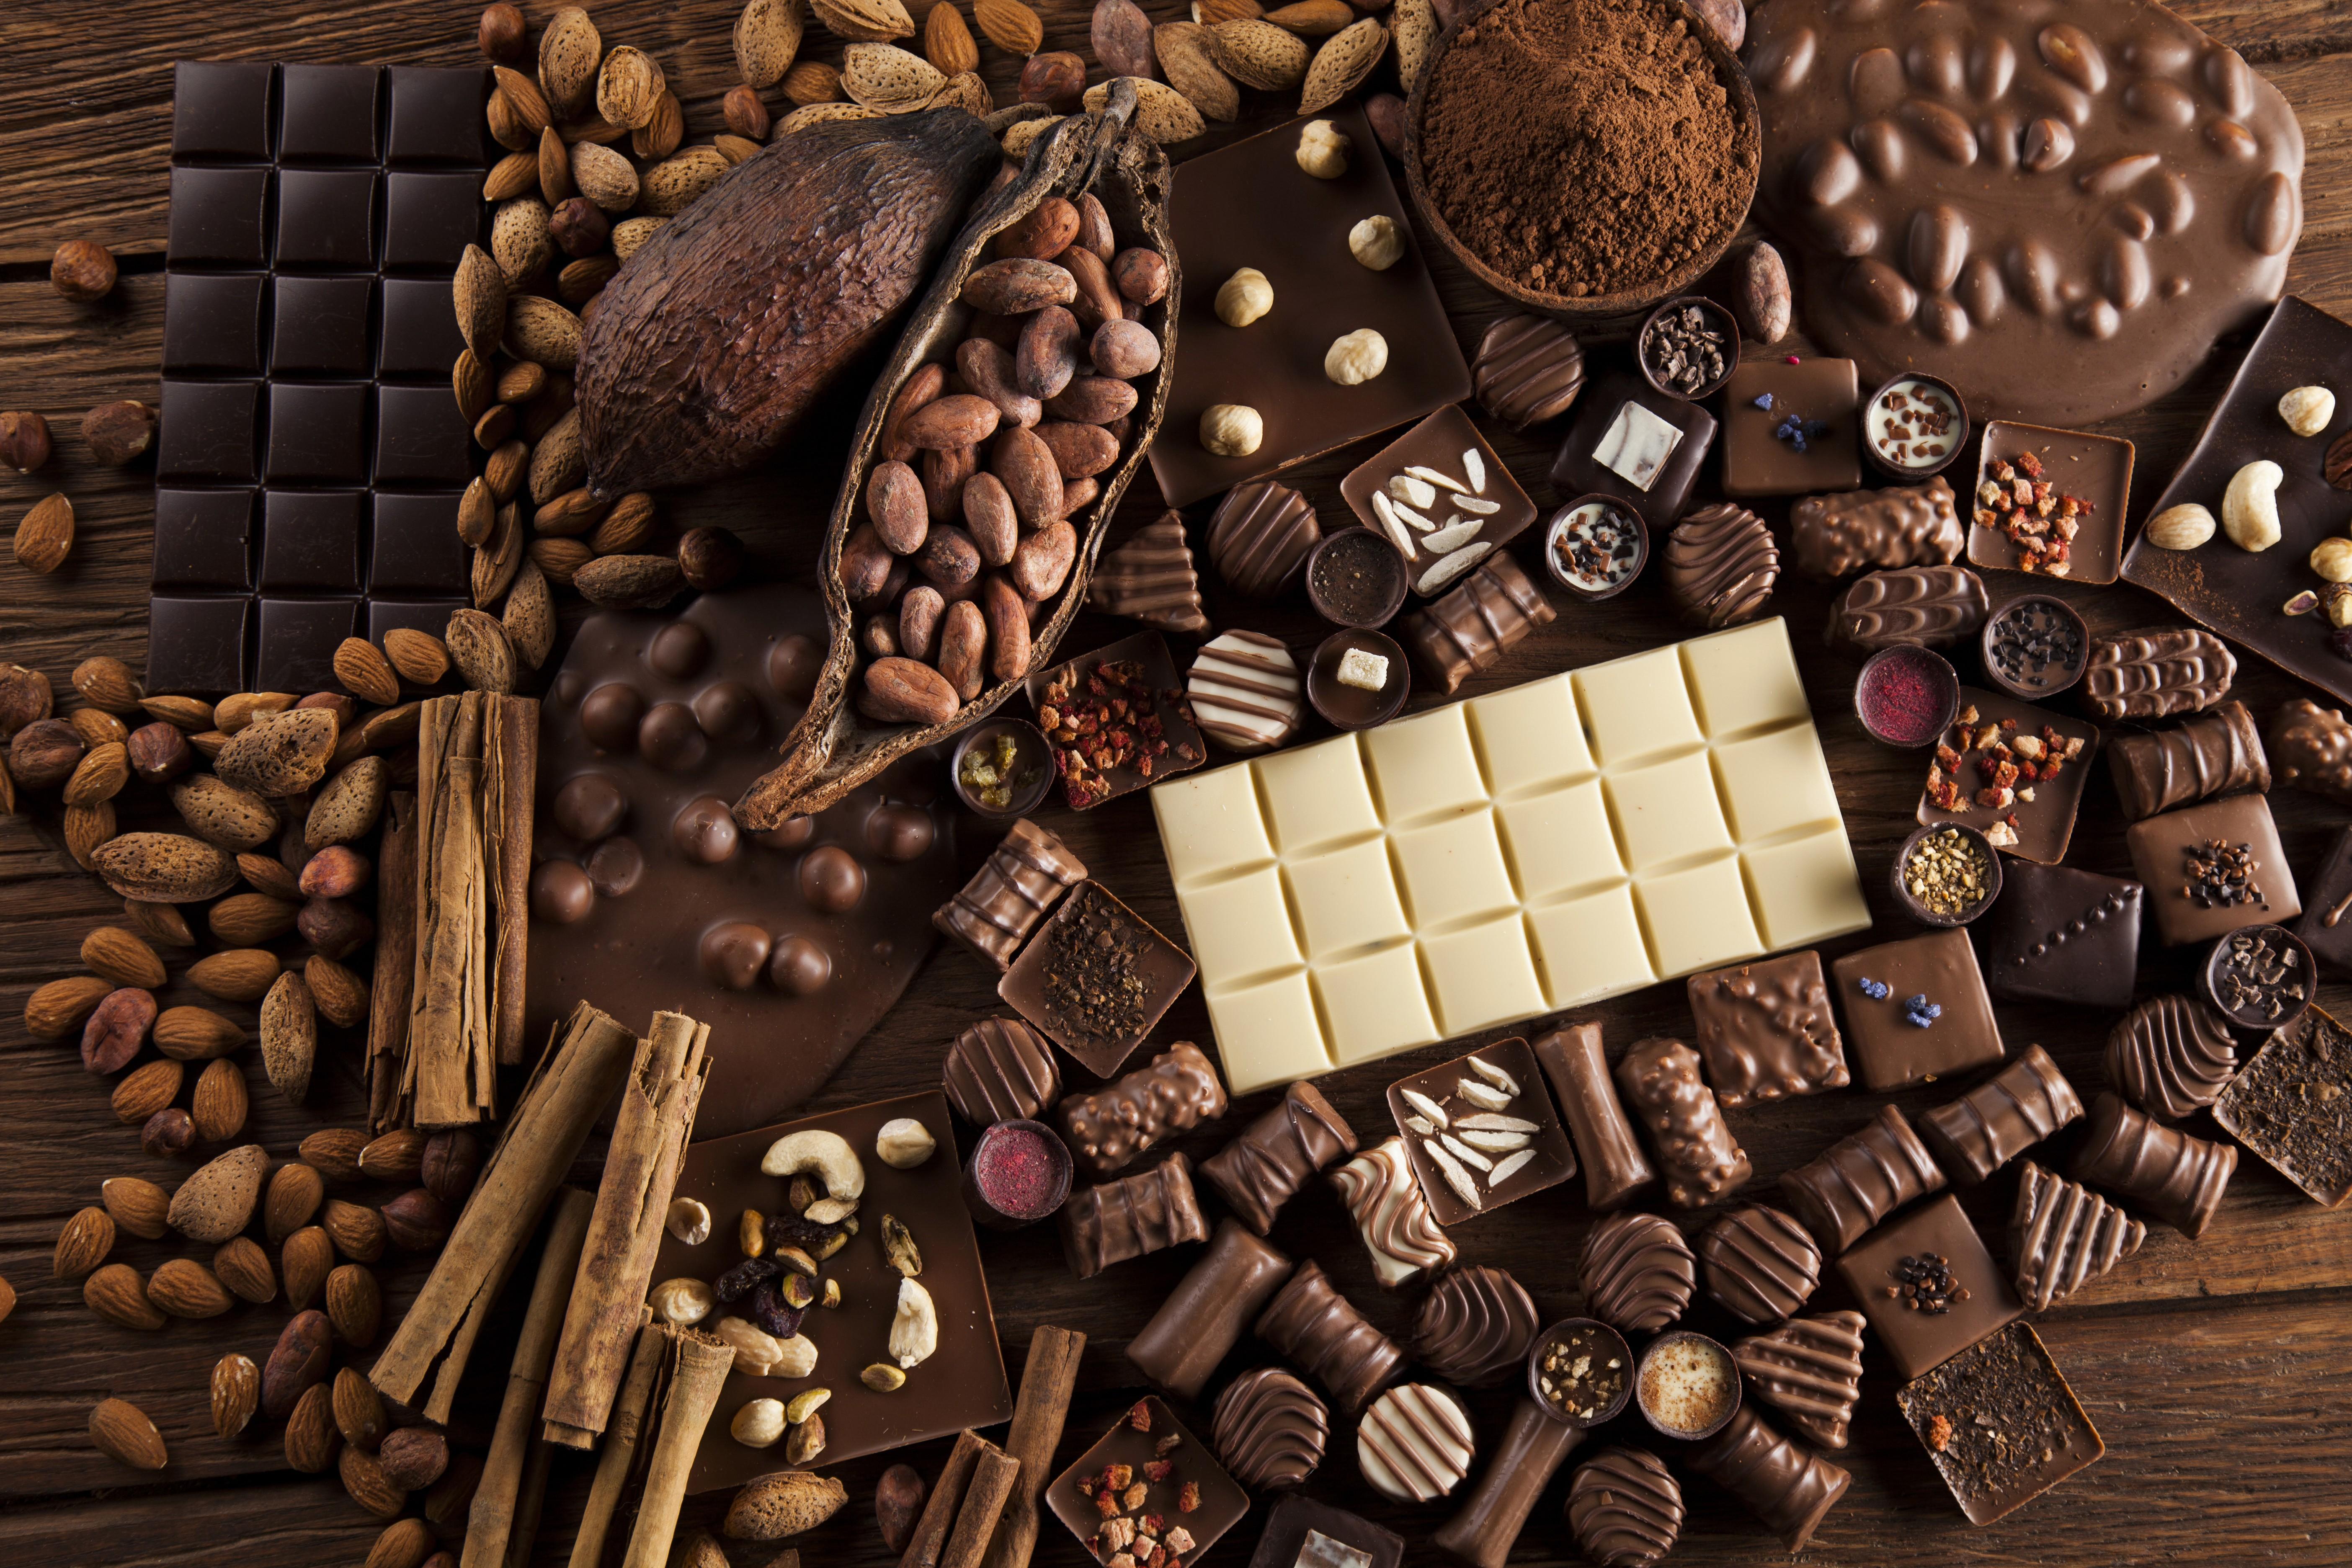 Wallpaper Chocolate Cocoa Delicious 5k Food 17848